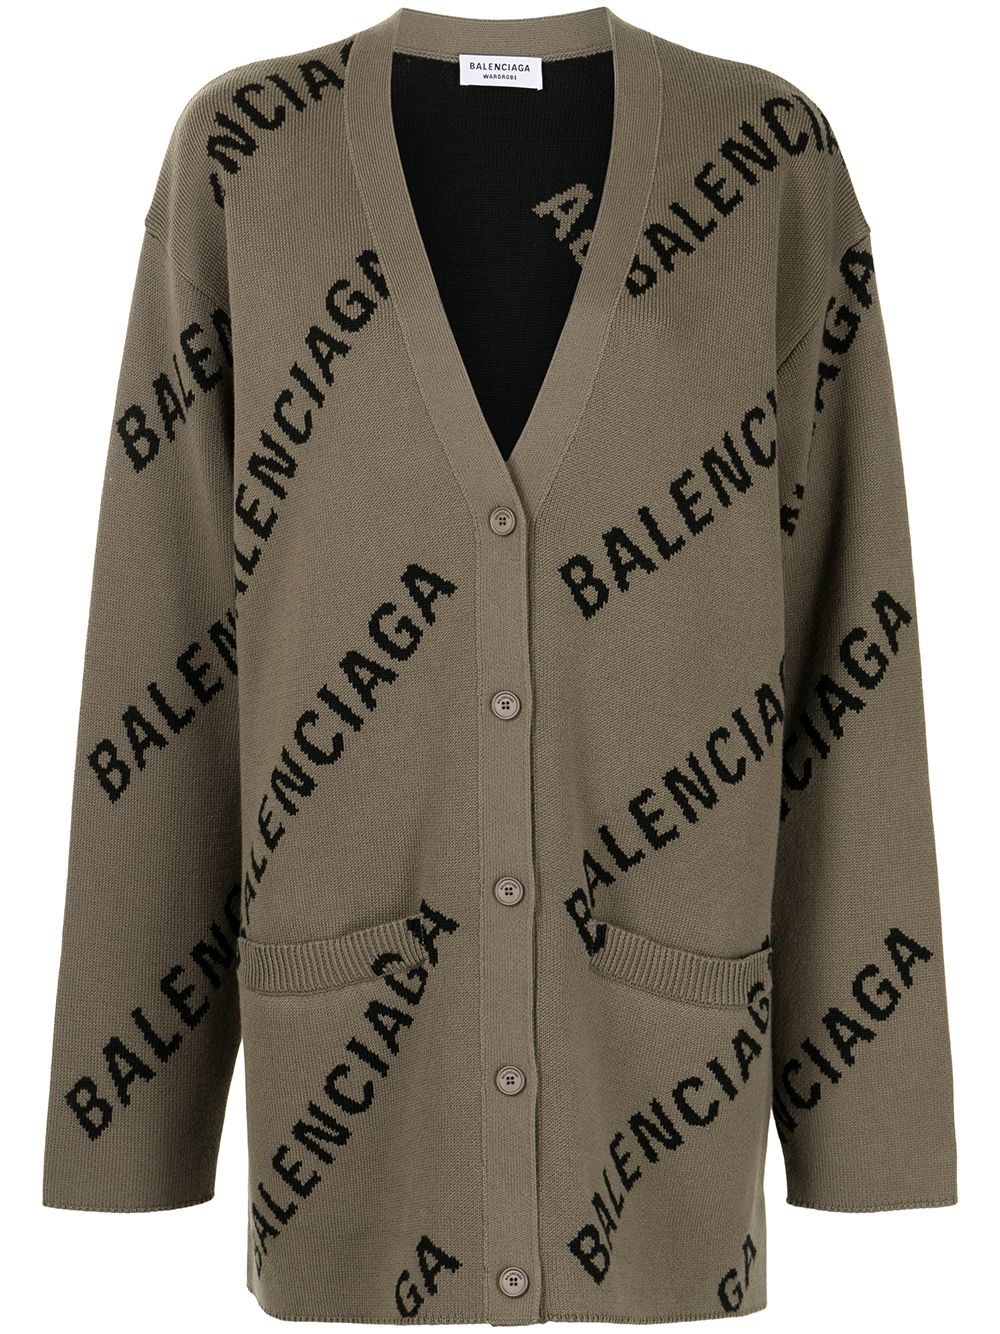 Light brown cotton and wool oversized cardigan   BALENCIAGA |  | 659675-T32002900